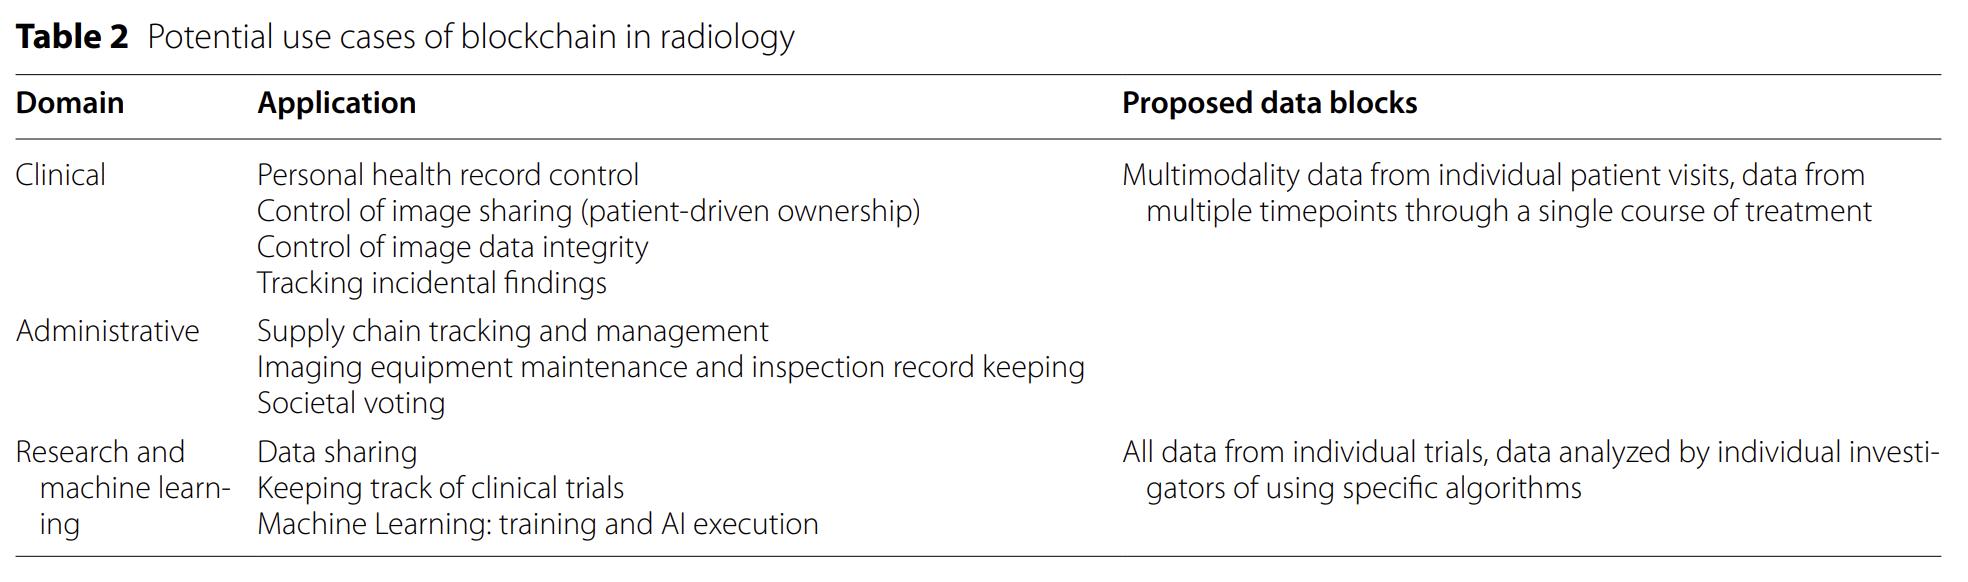 ESR white paper: blockchain and medical imaging